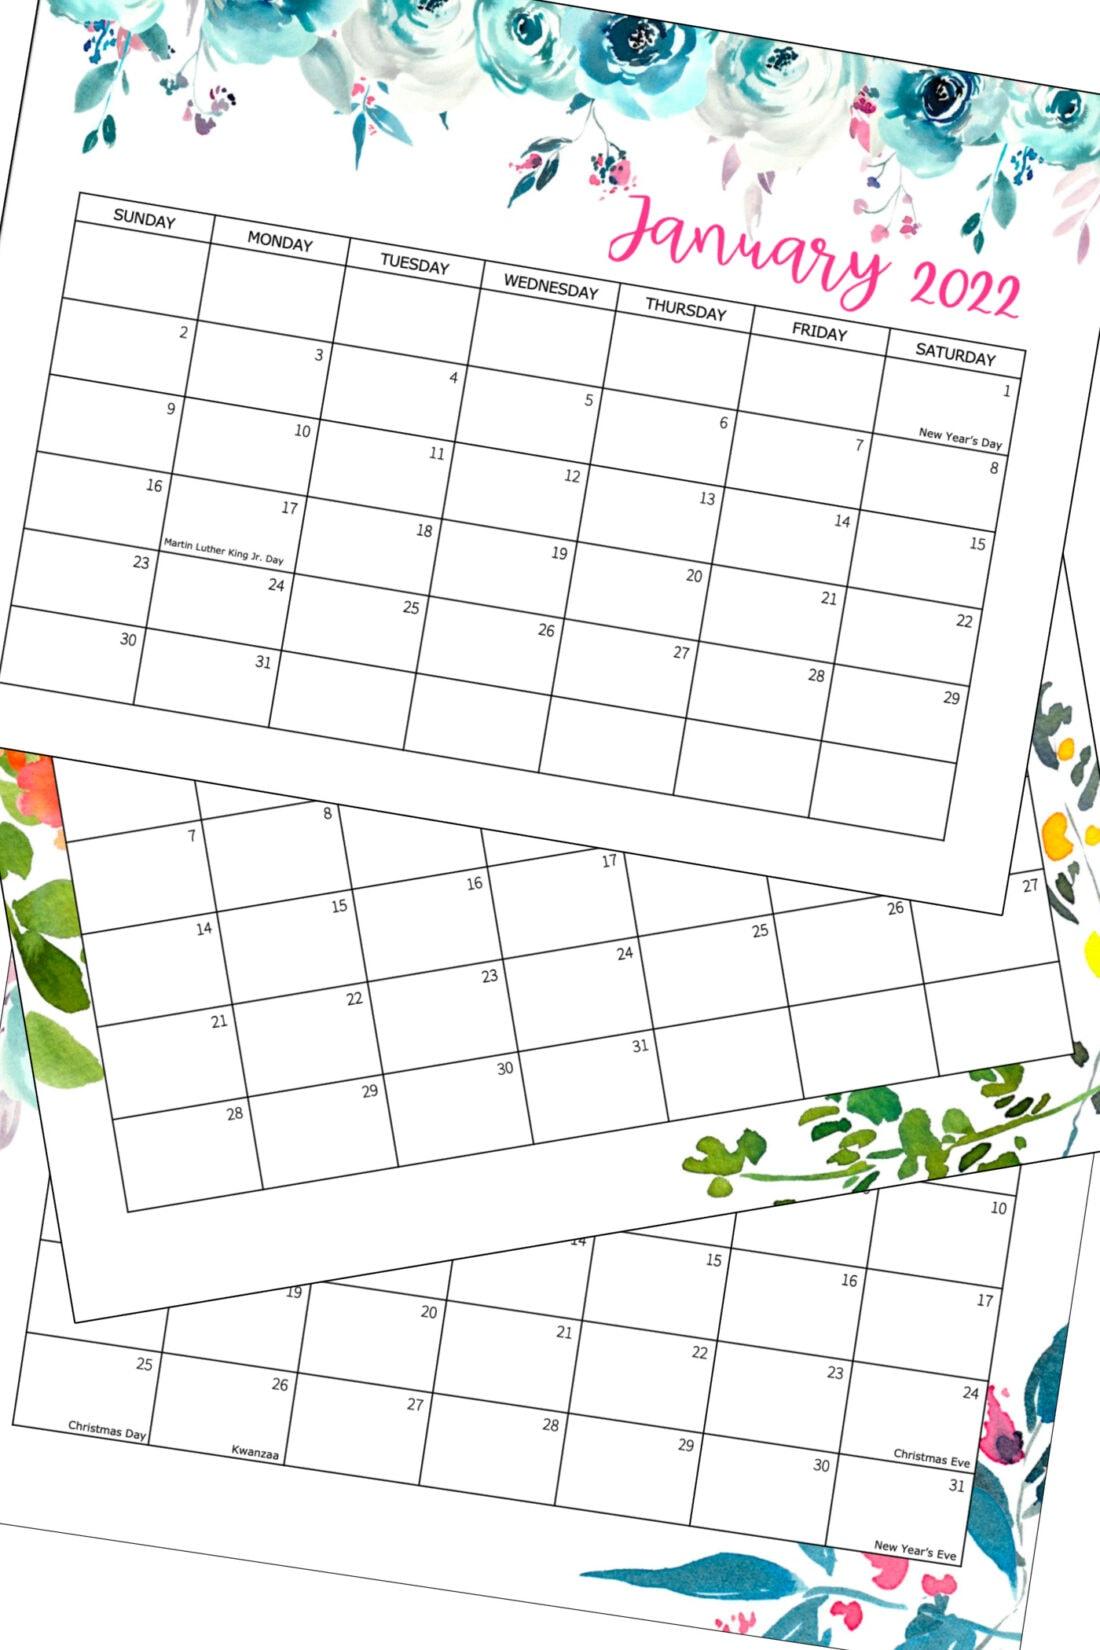 3 kalenderpagina's